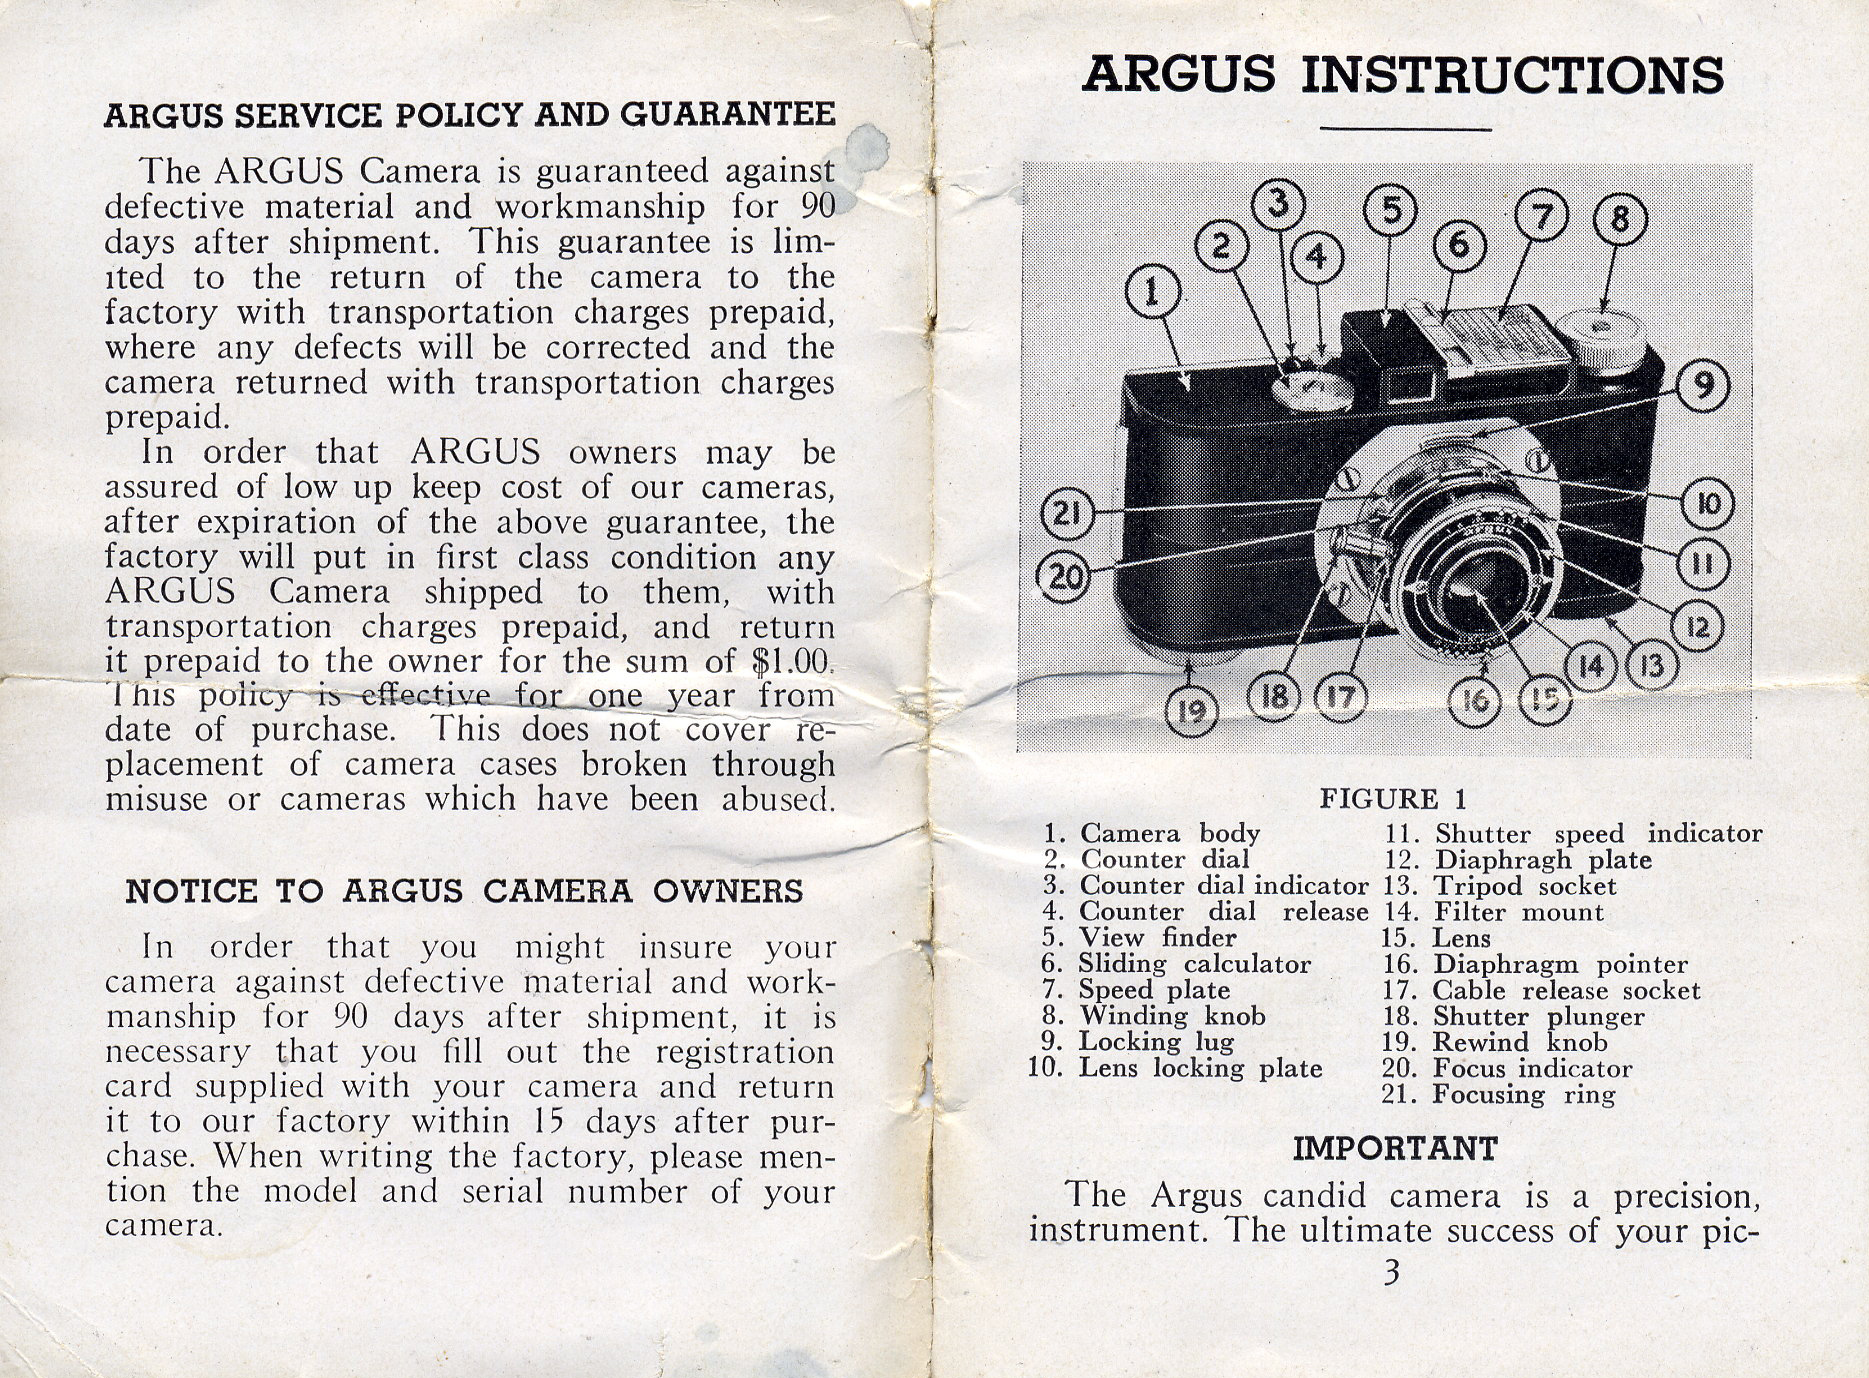 instructions for operating model a2f argus camera ann arbor rh aadl org camera instruction manual e-m10 camera instructions manual em10 mark 2